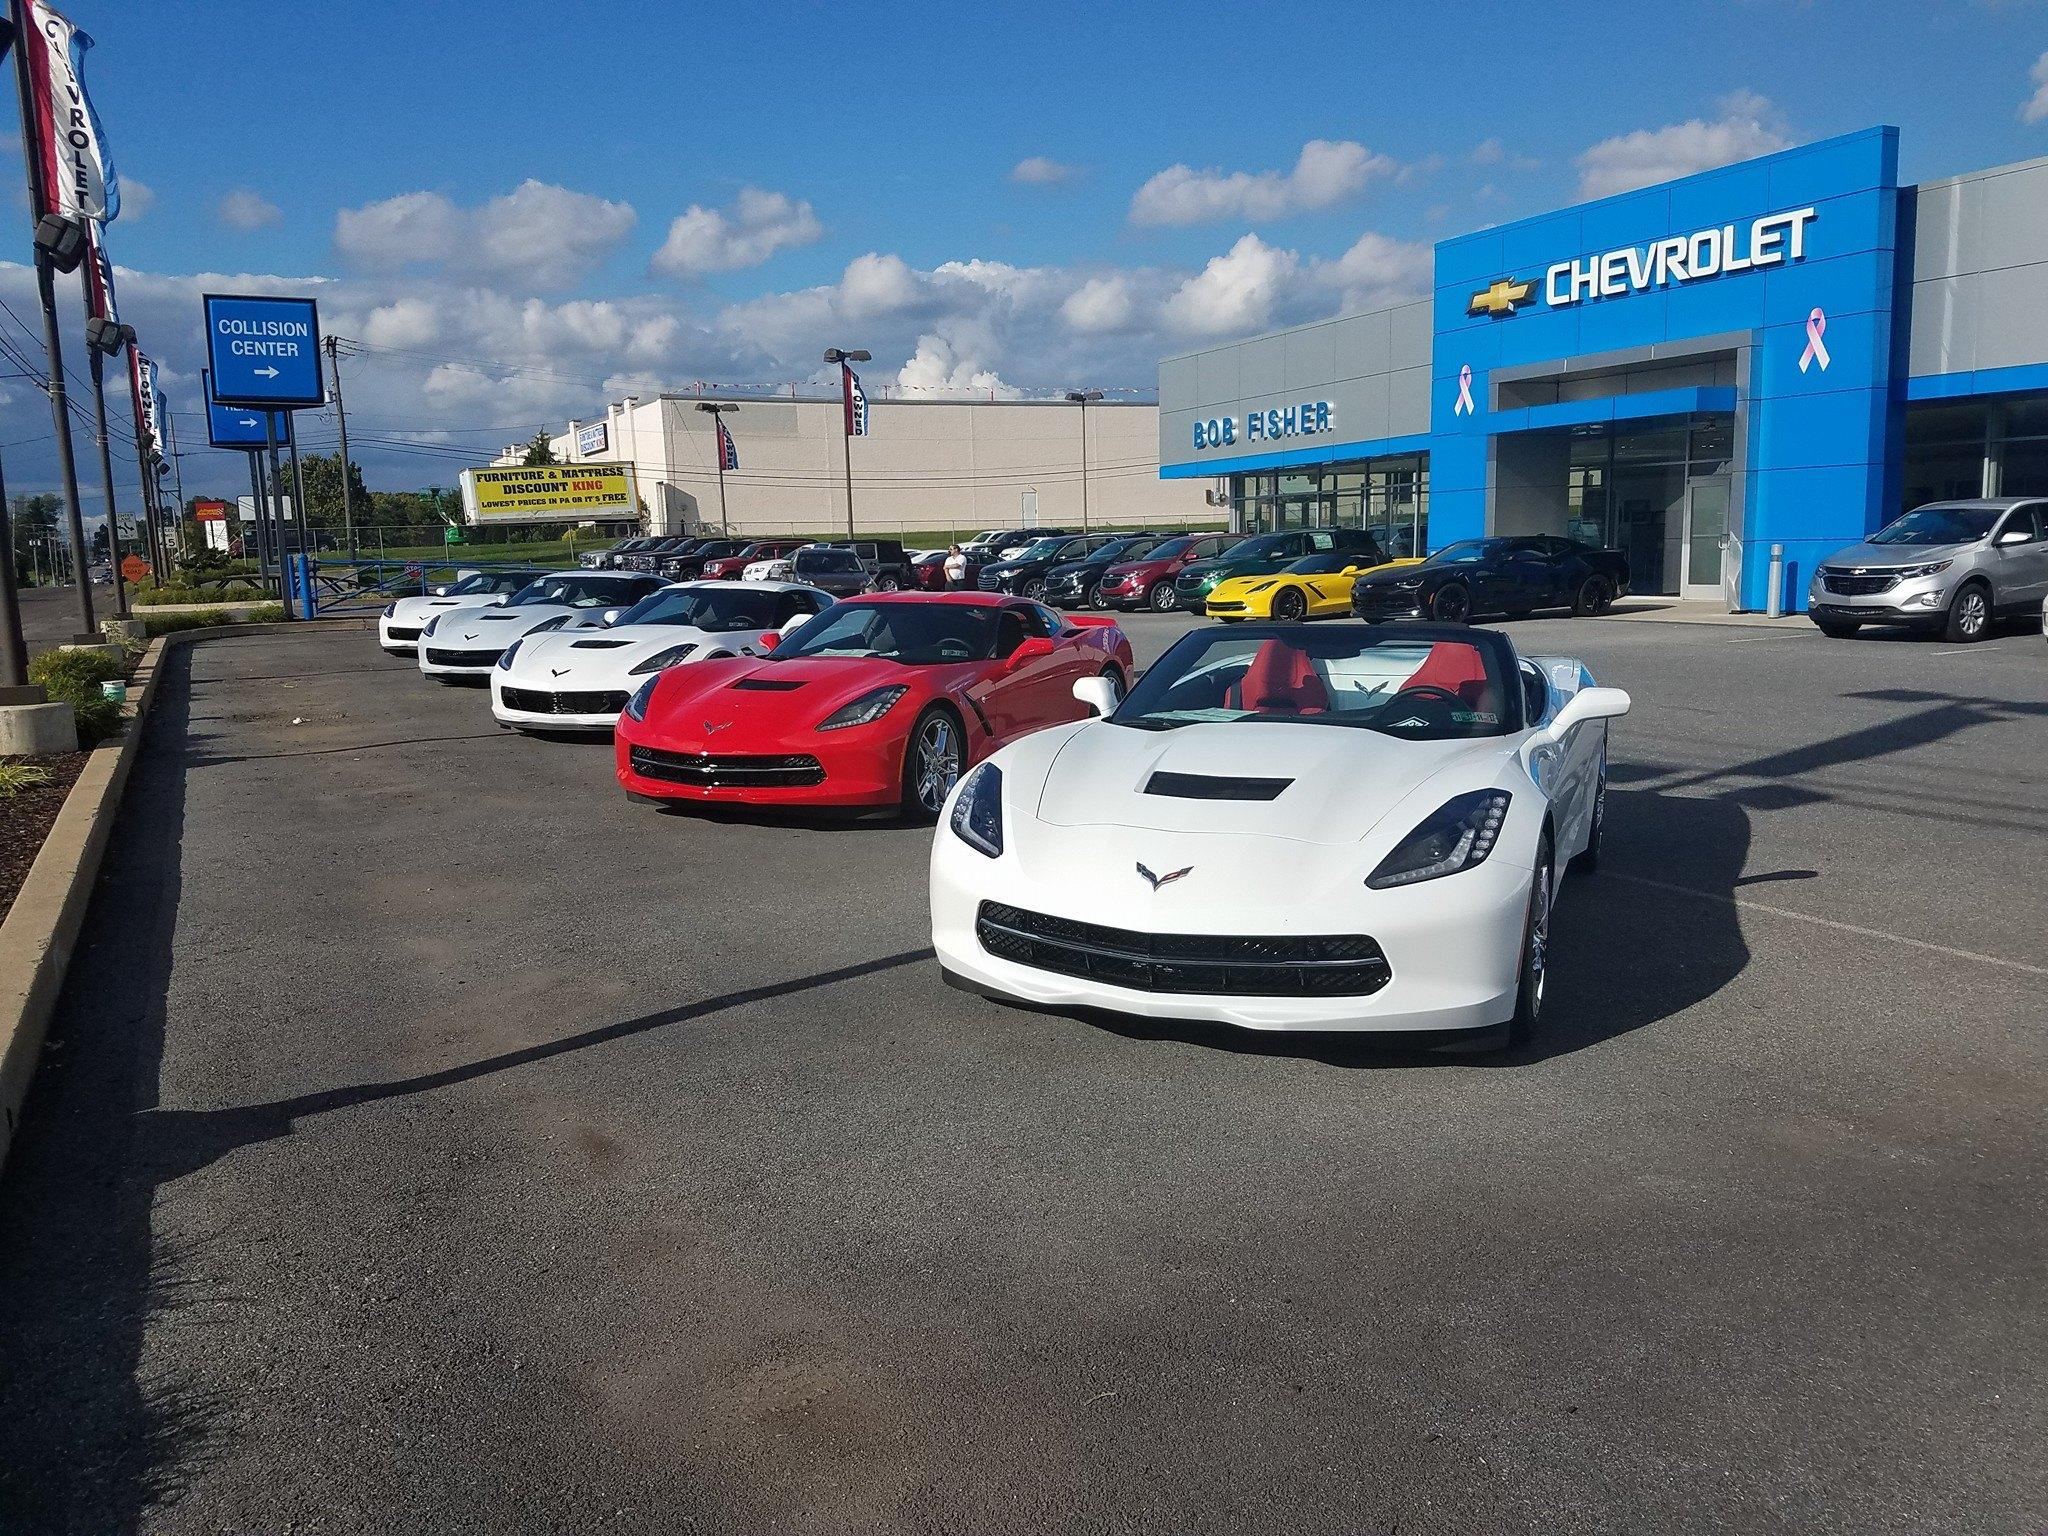 Bob Fisher Chevrolet image 0